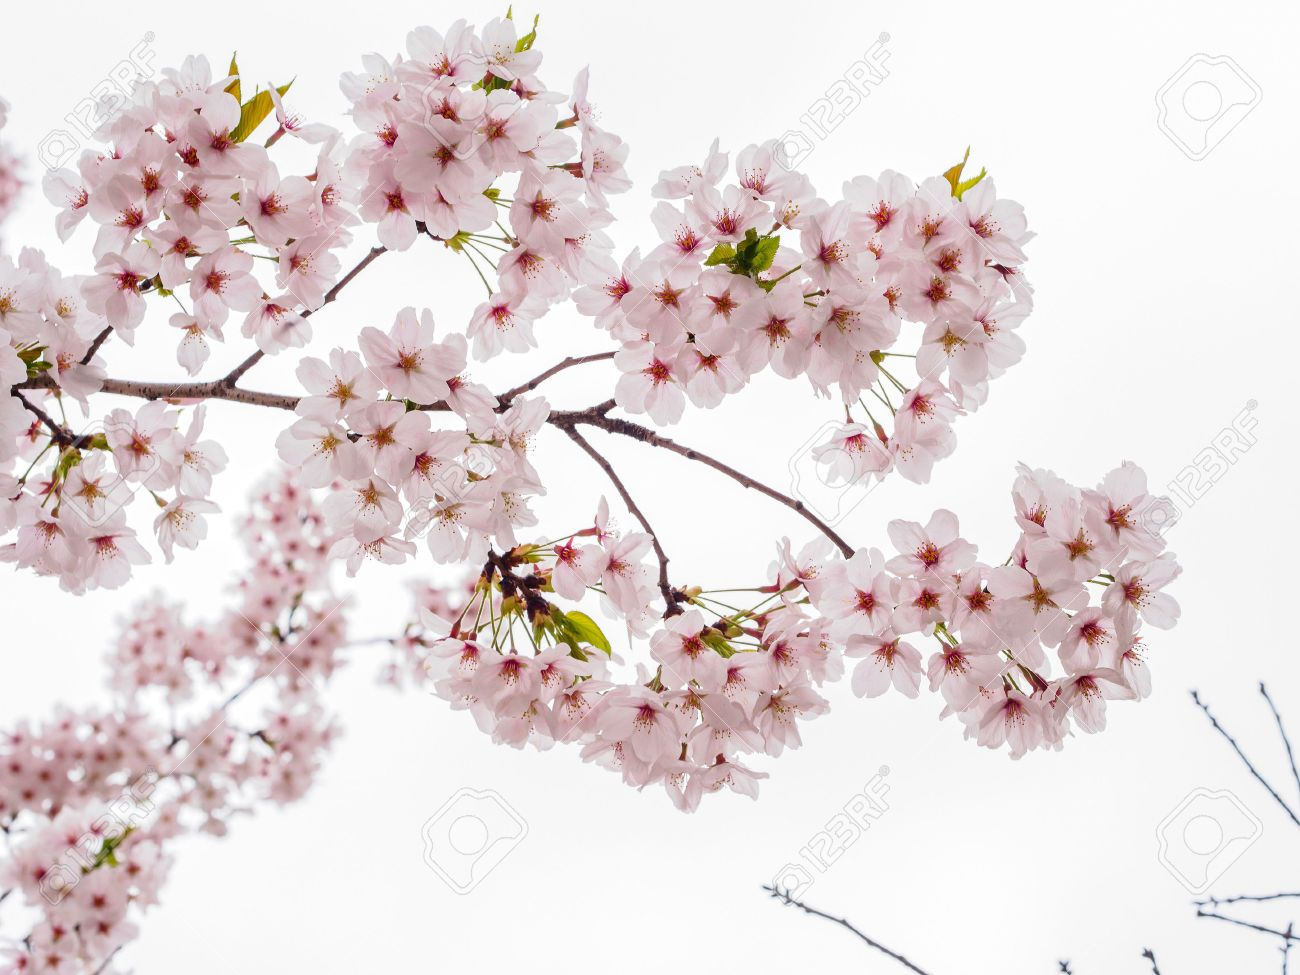 Spring Flowers Series Beautiful Cherry Blossom Pink Sakura Spring Flowers Pictures Of Spring Flowers Cherry Blossom